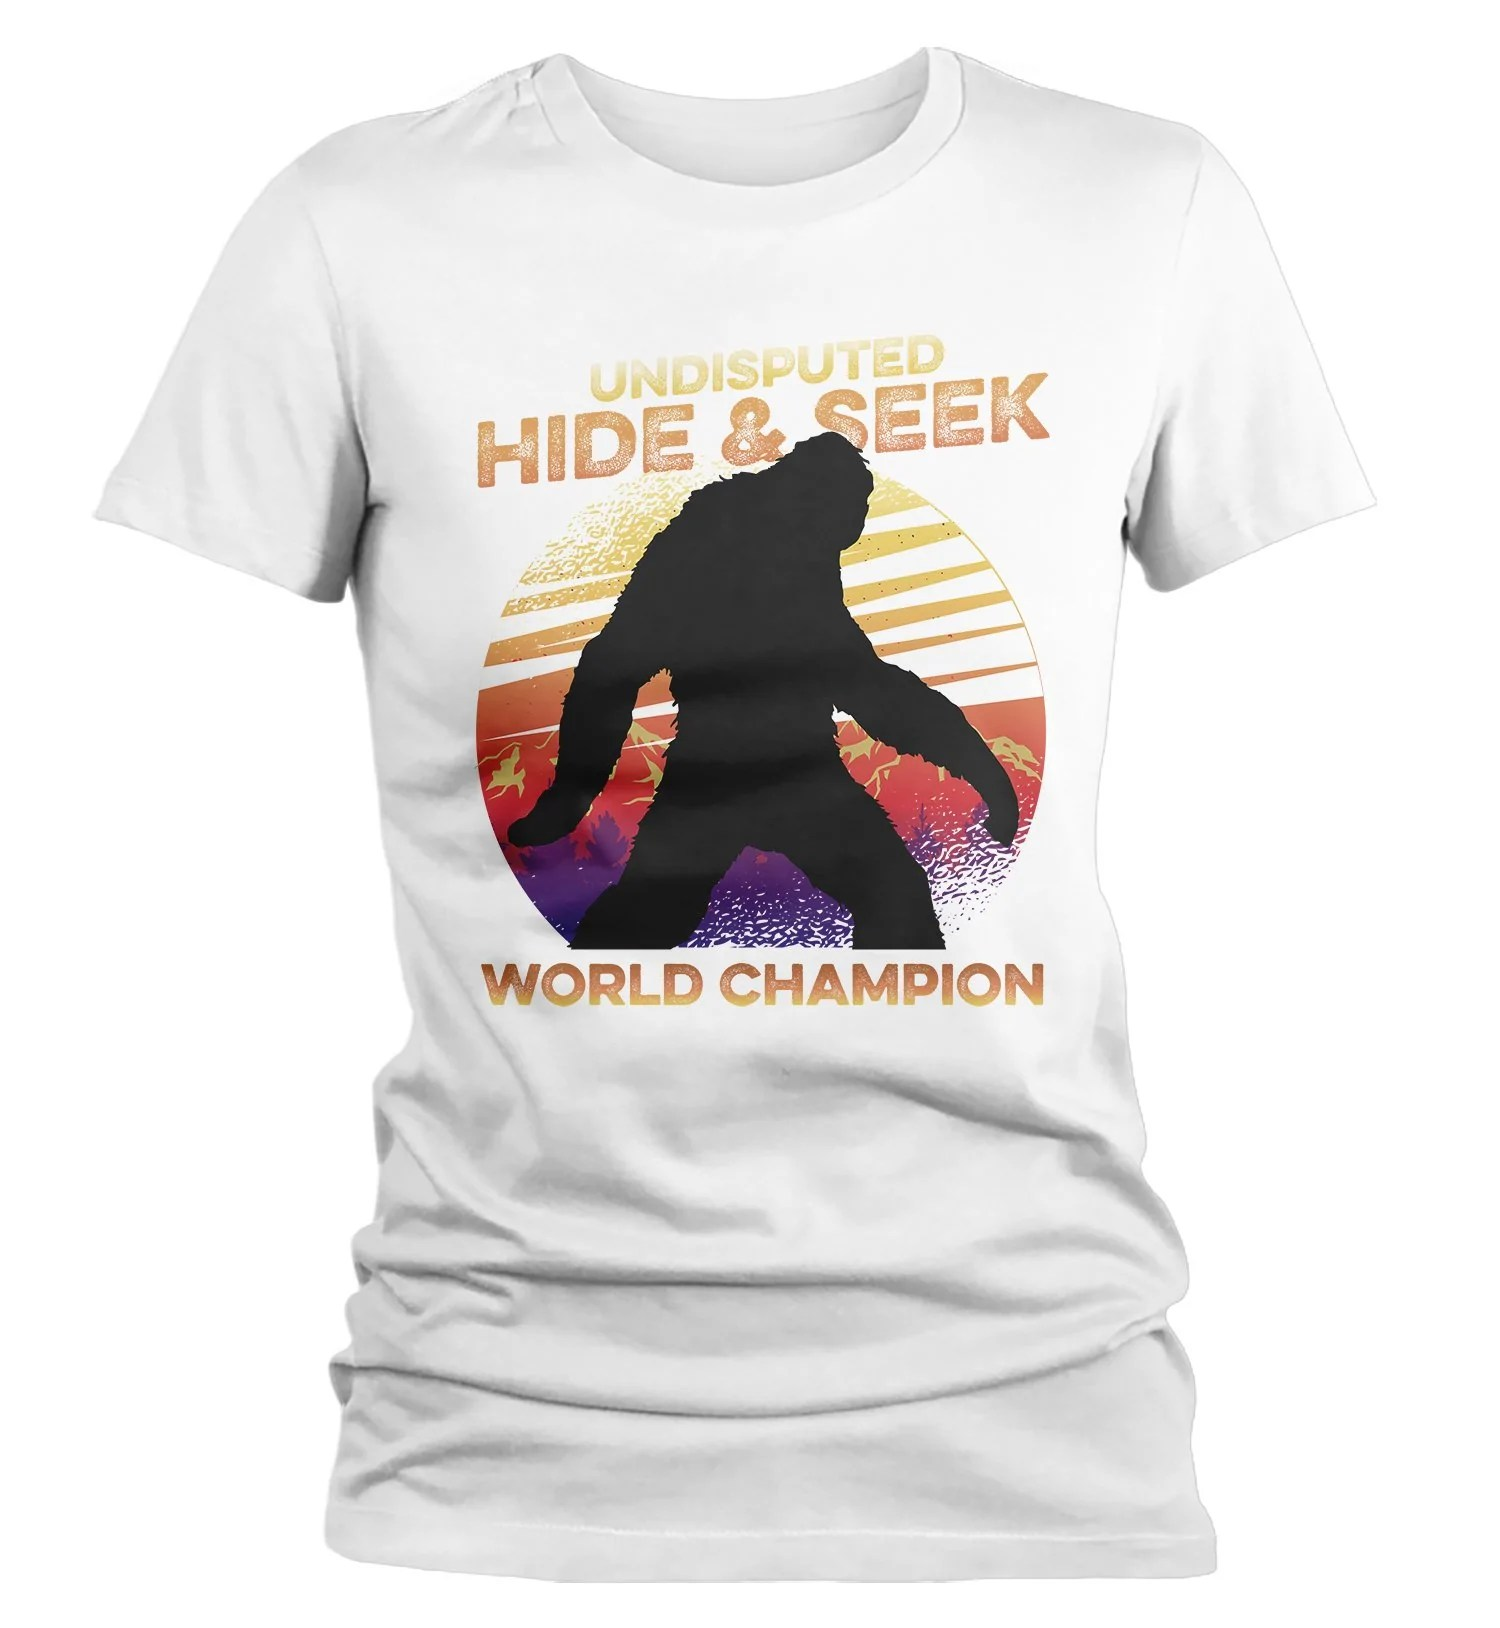 Womens Funny Bigfoot T Shirt Hide And Seek World Champion Sasquatch Tee Grunge Hipster Shirt